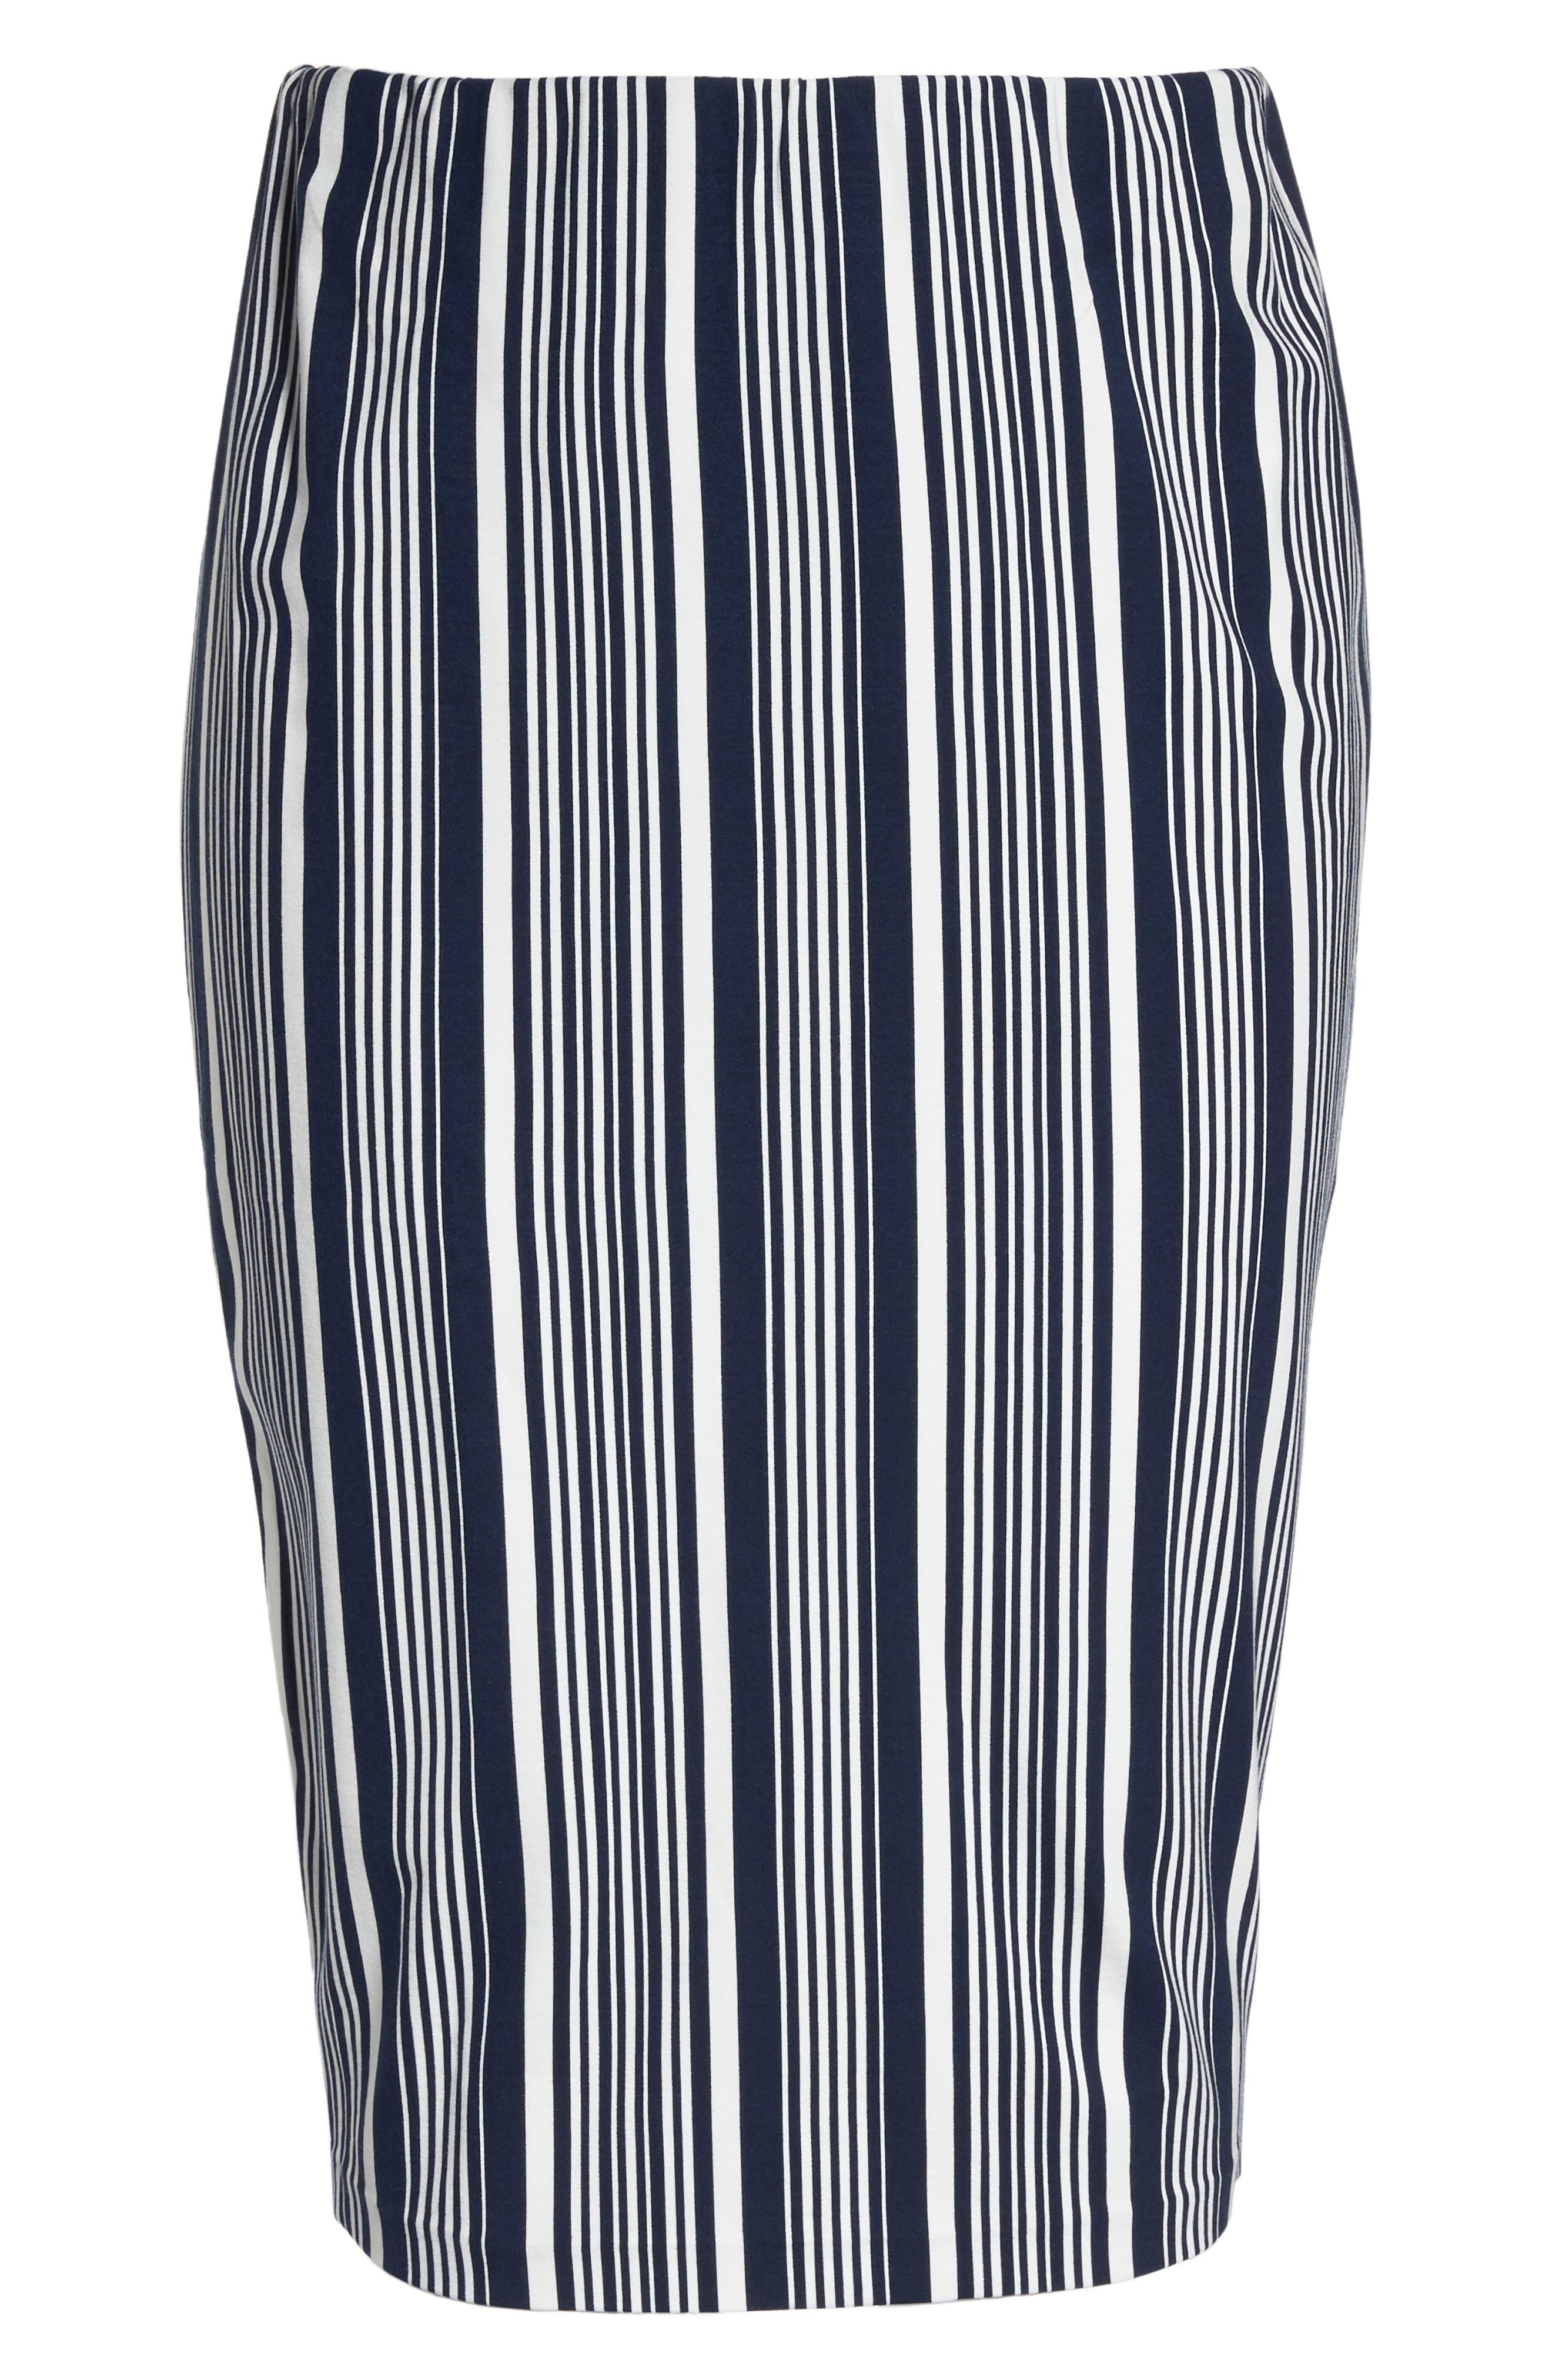 Stripe Ponte Pencil Skirt,                             Alternate thumbnail 6, color,                             Navy Alexis Stripe